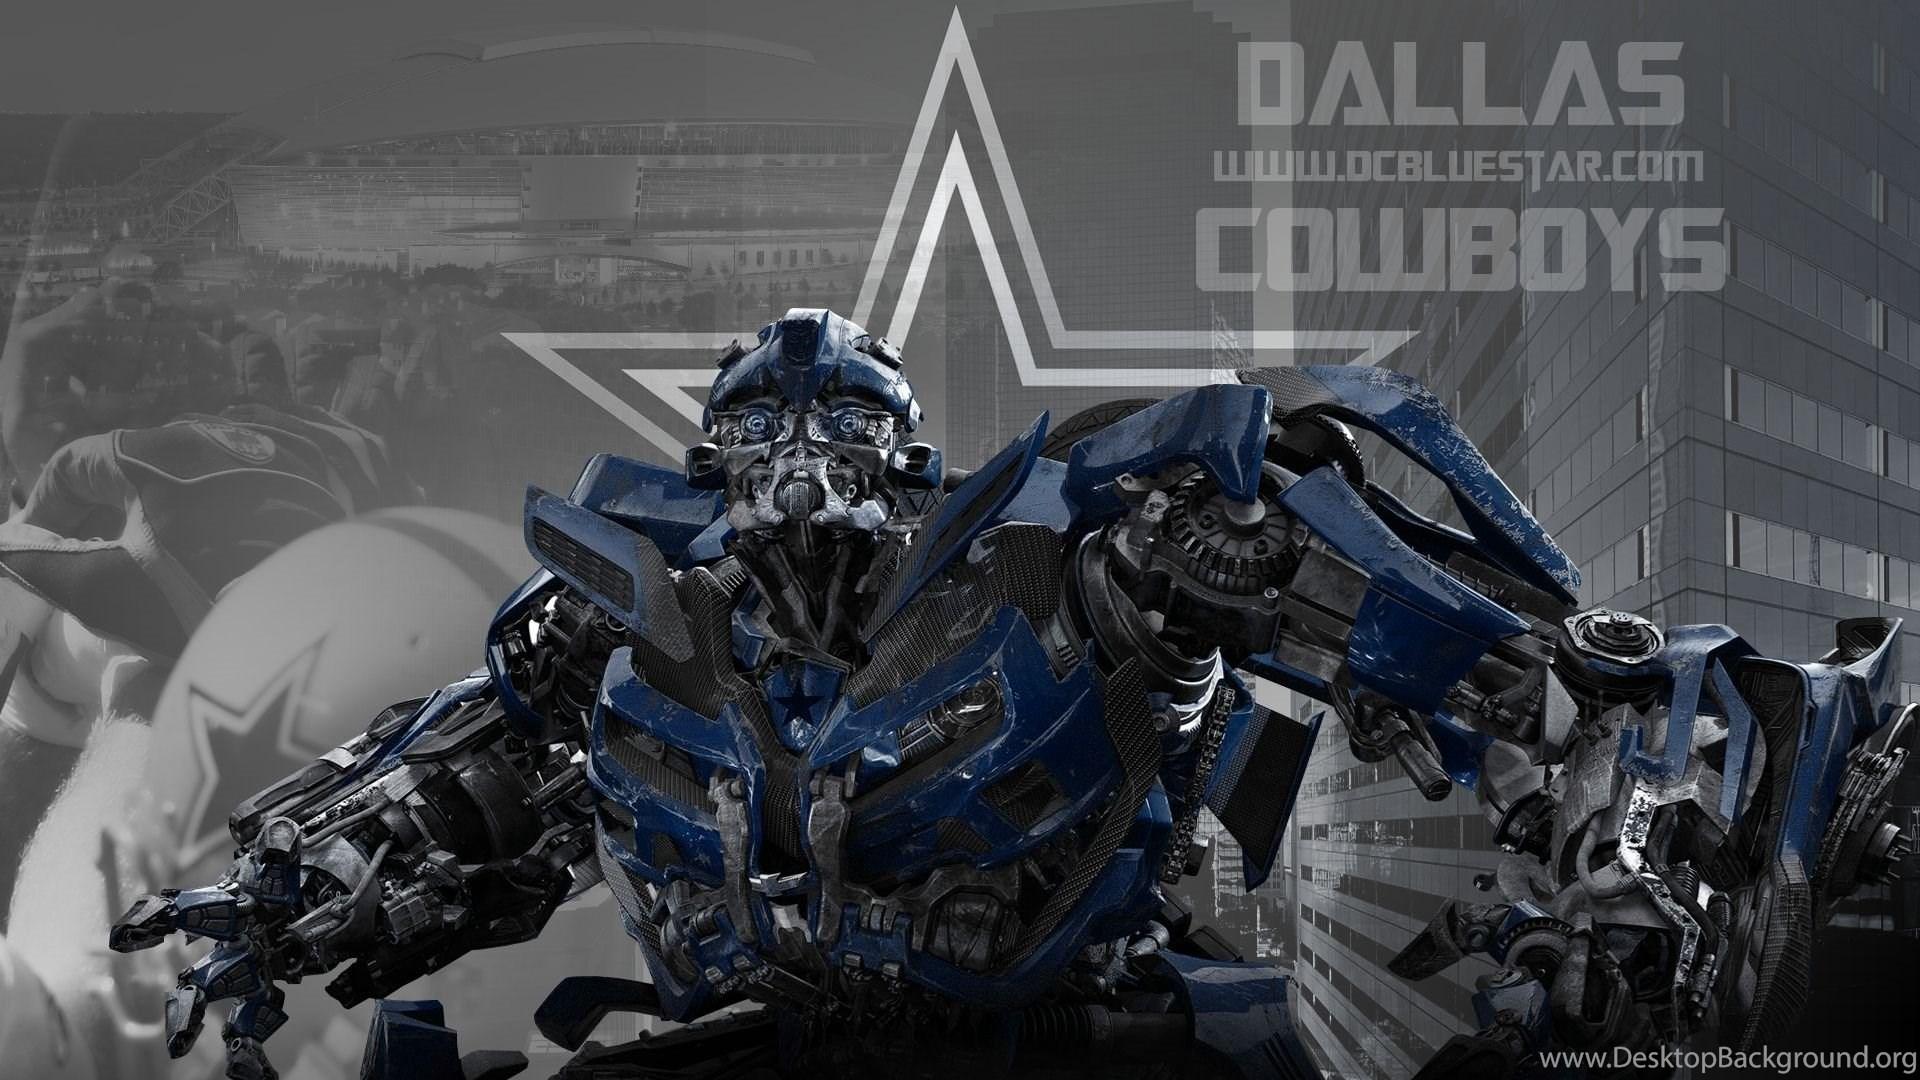 Download Dallas Cowboys Live Wallpapers TN8 Foto Gambar